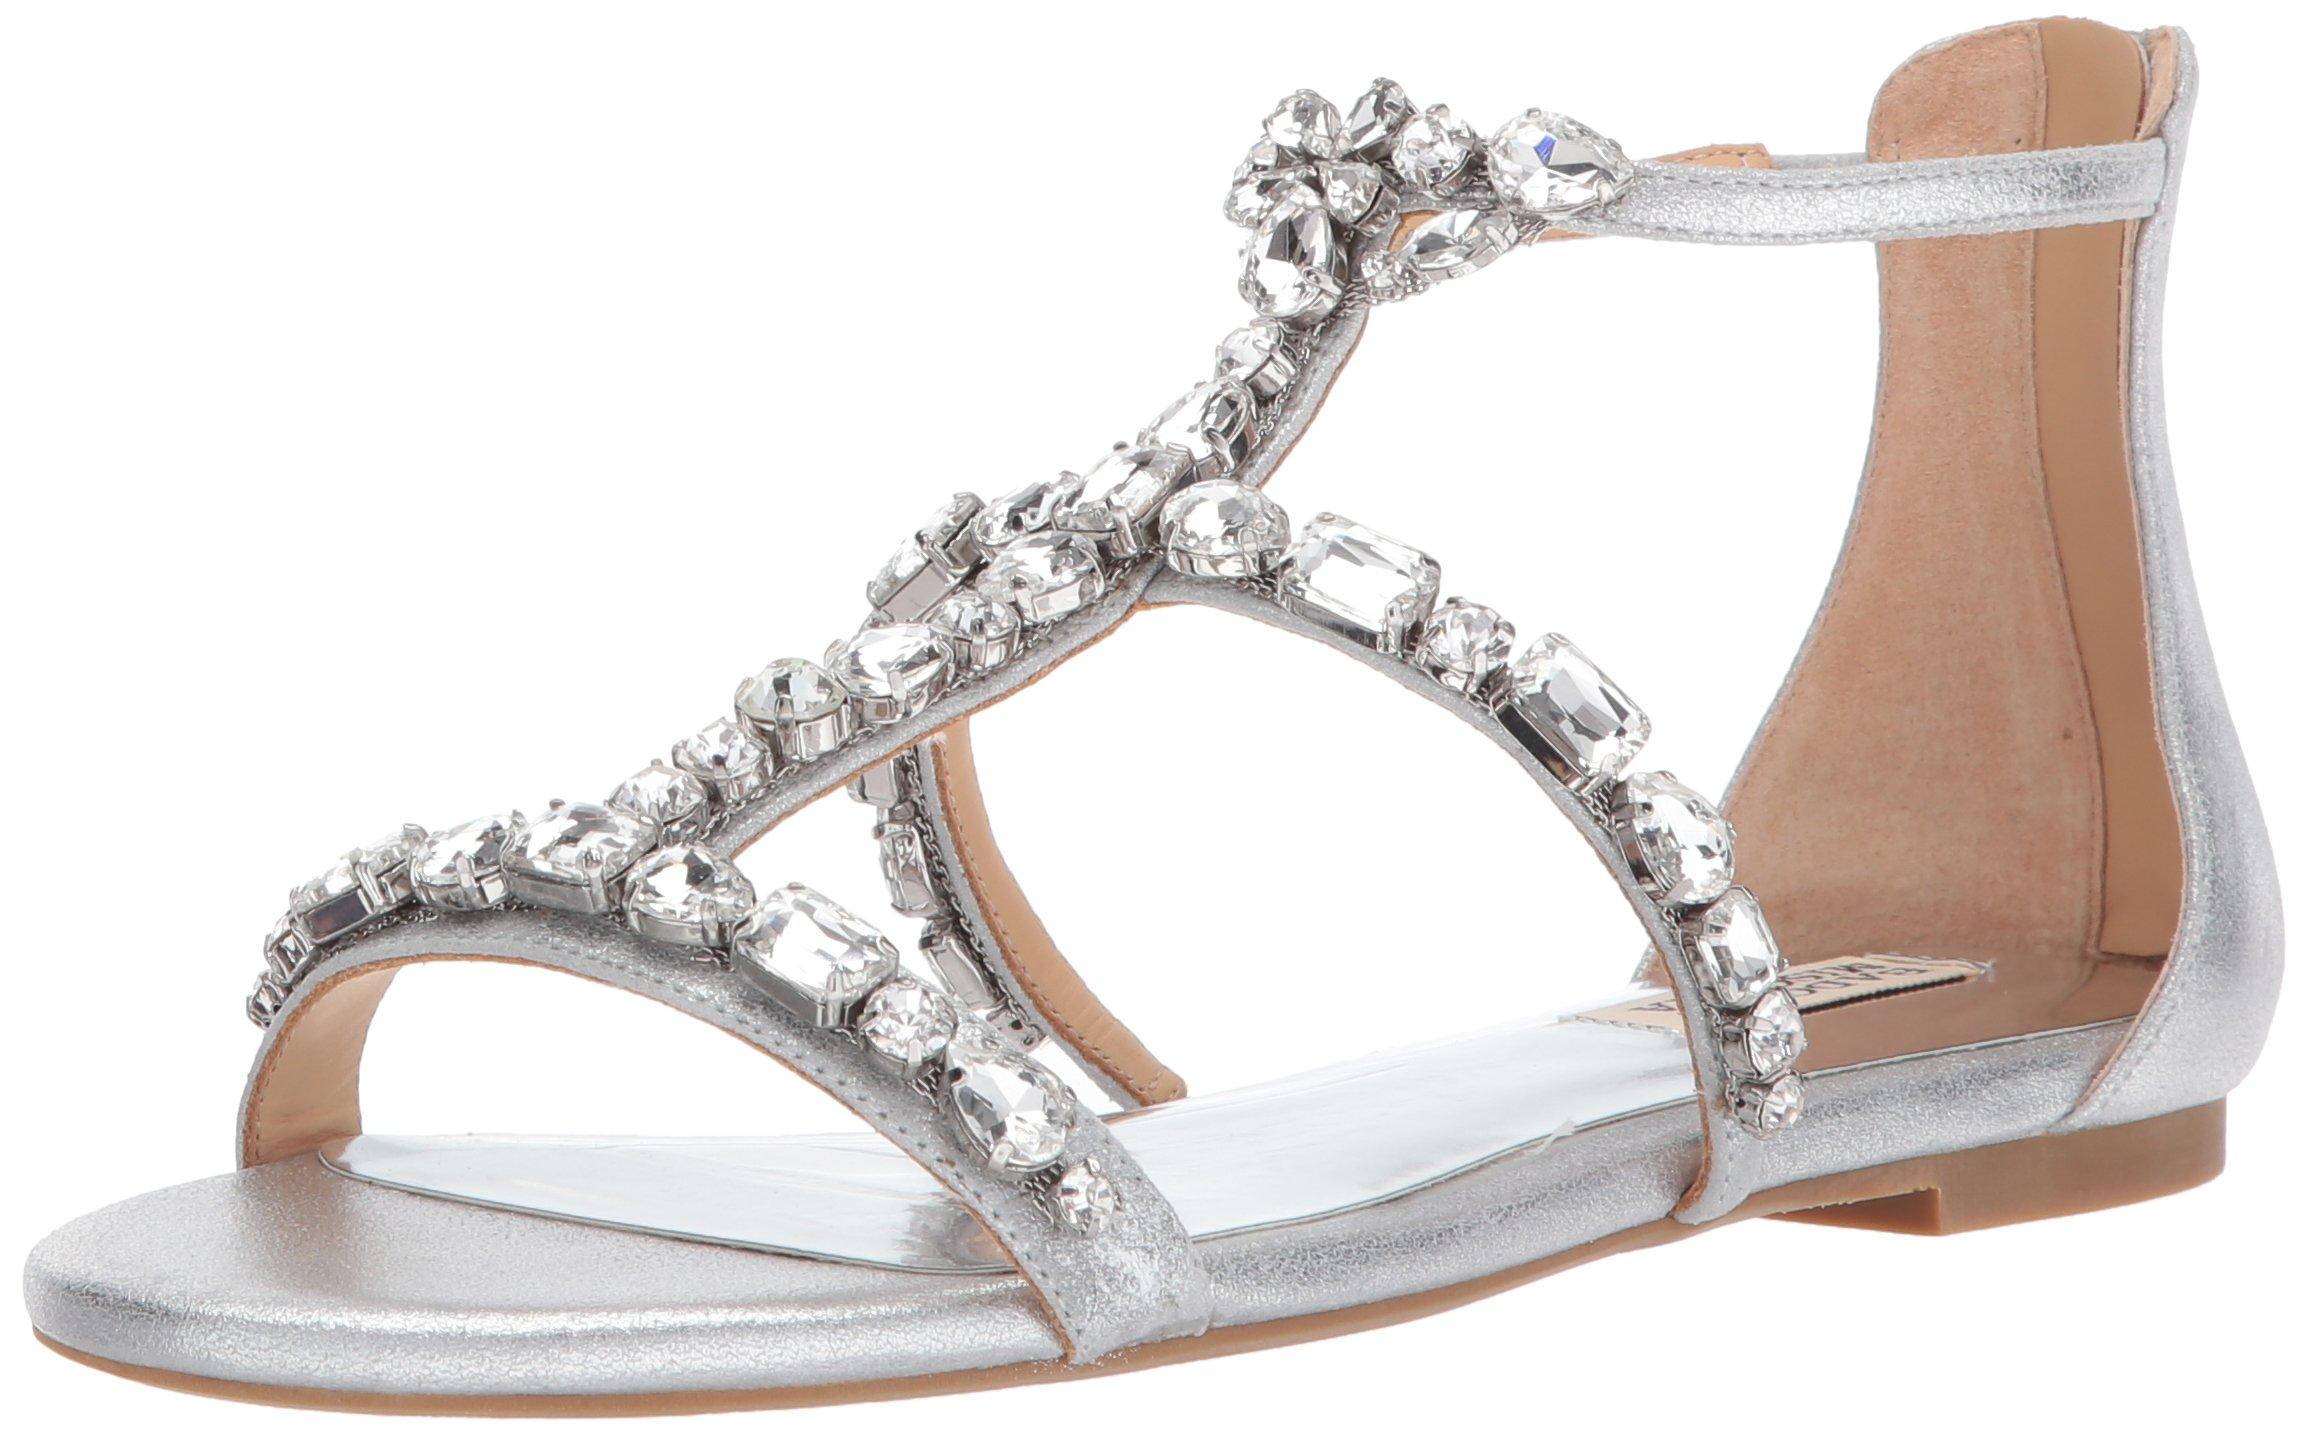 Badgley Mischka Women's Waren Flat Sandal, Silver, 8 M US